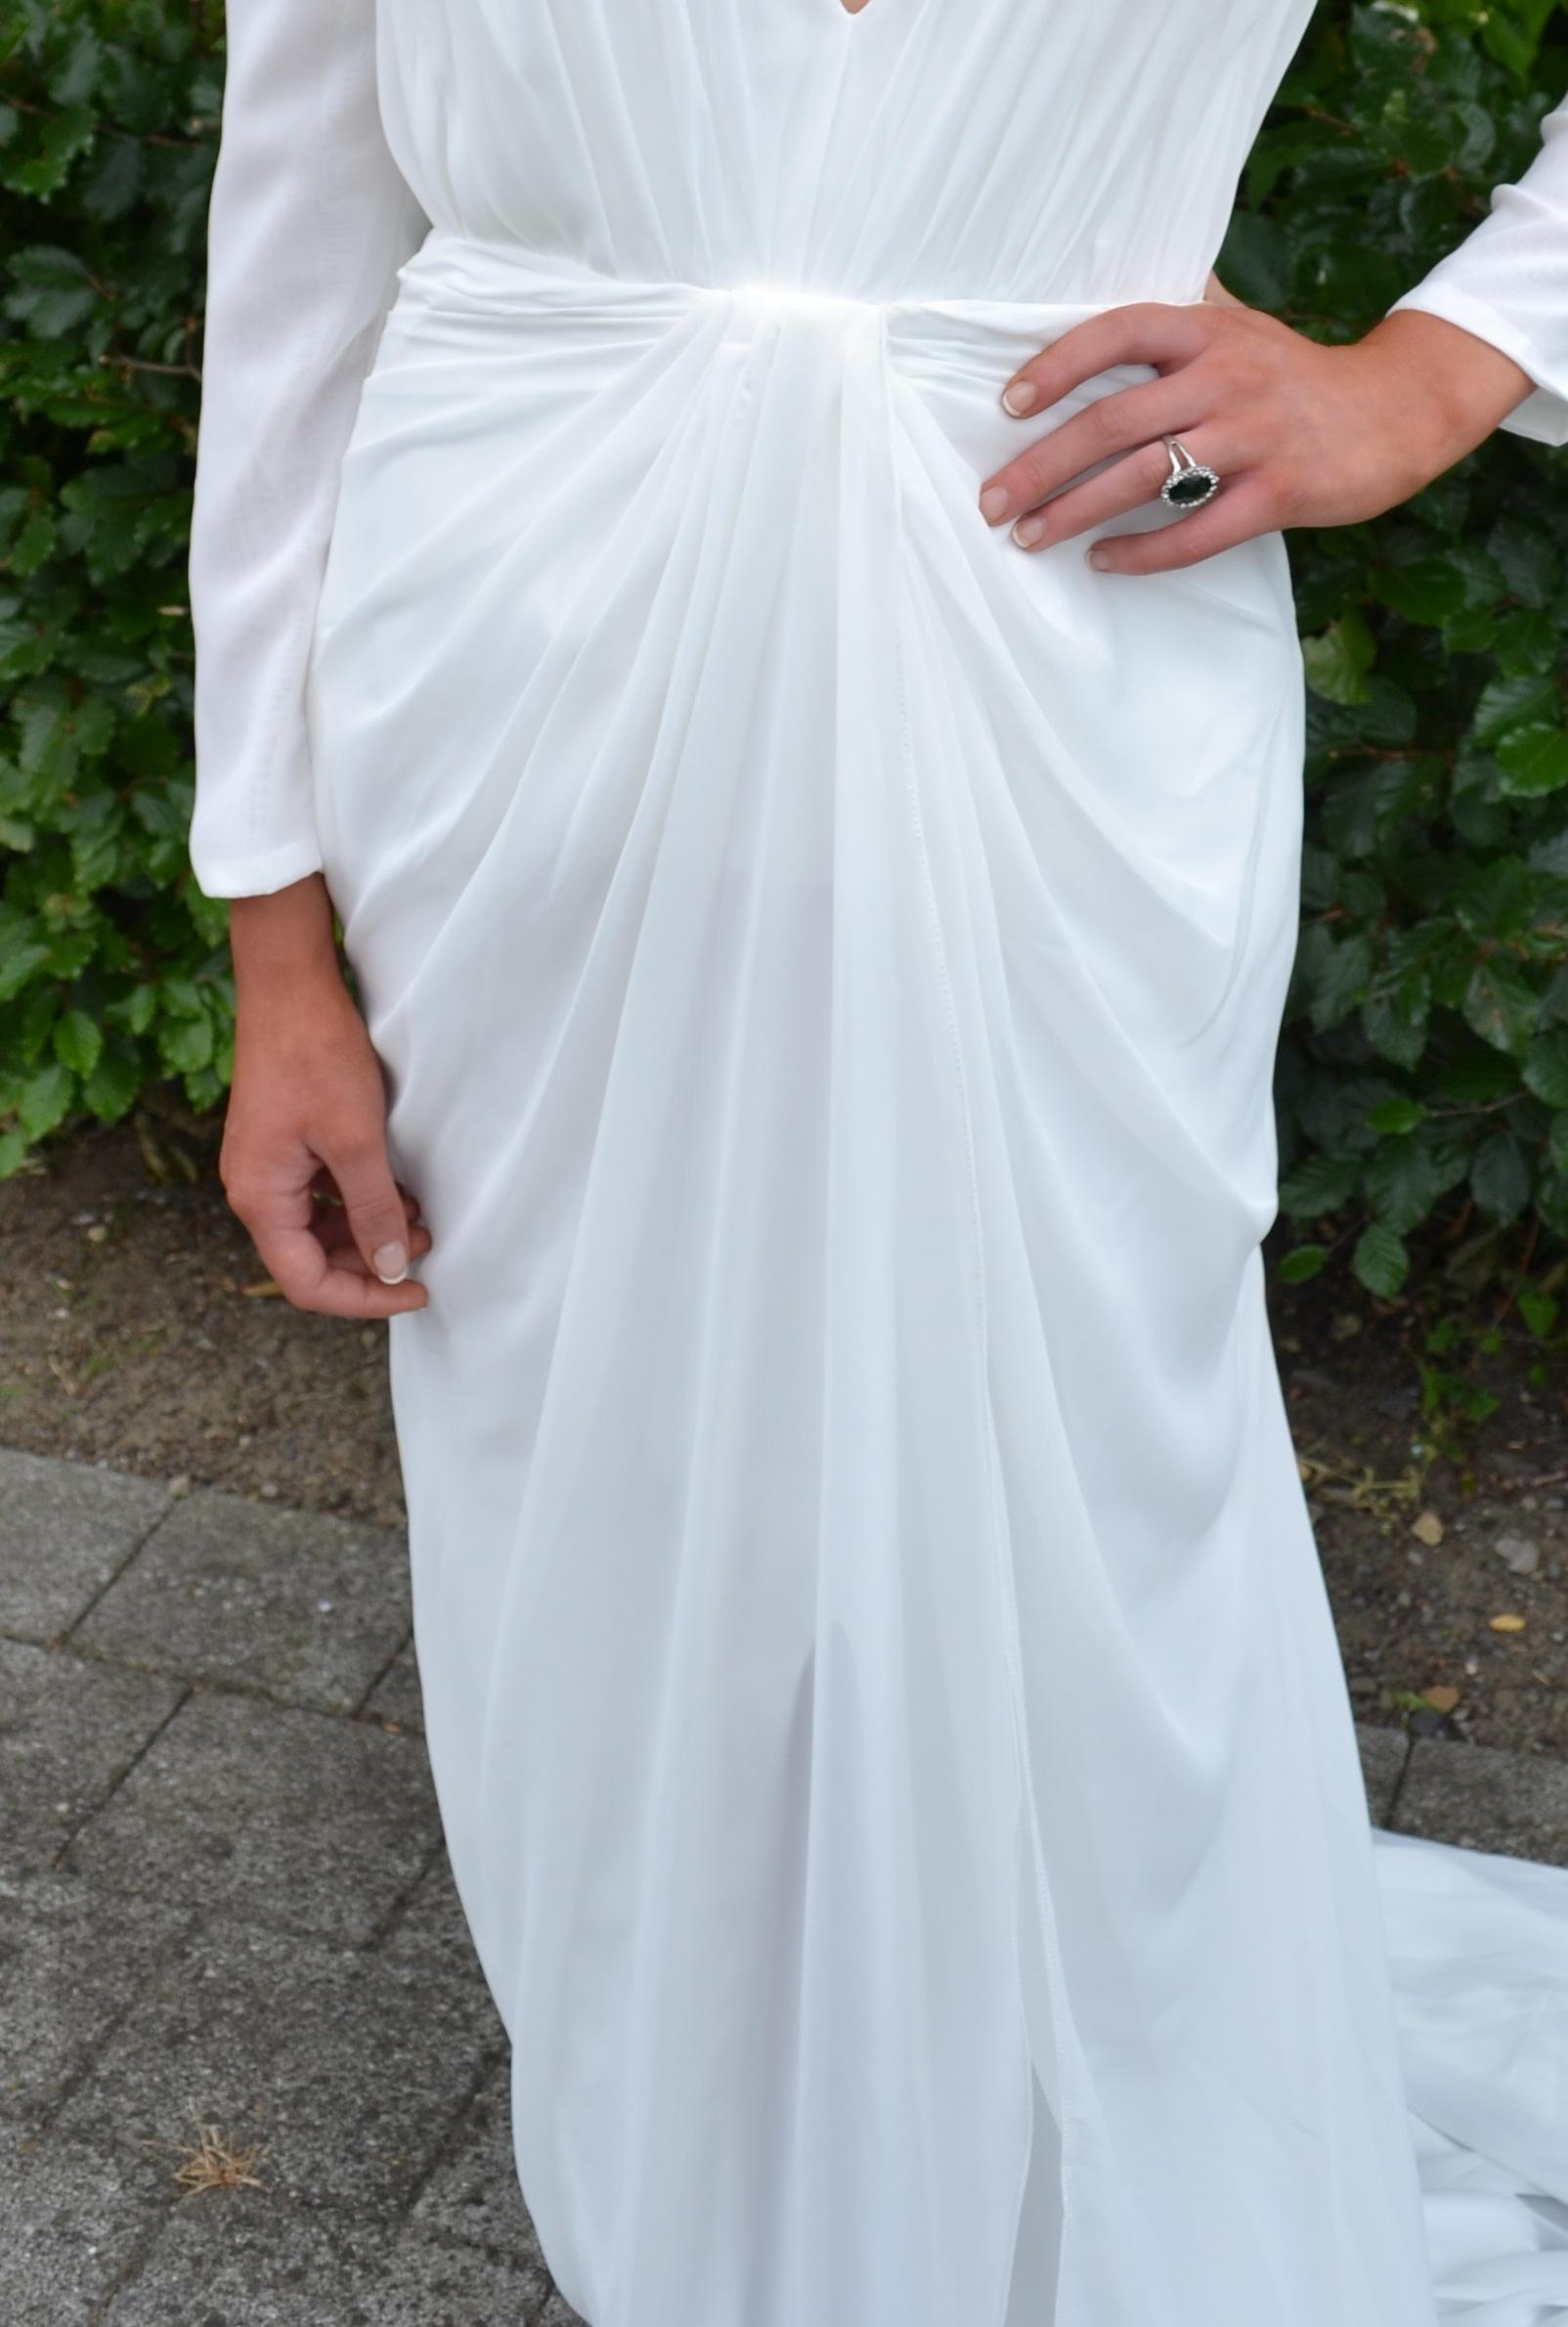 white bridal gown TheodoraJames..JPG